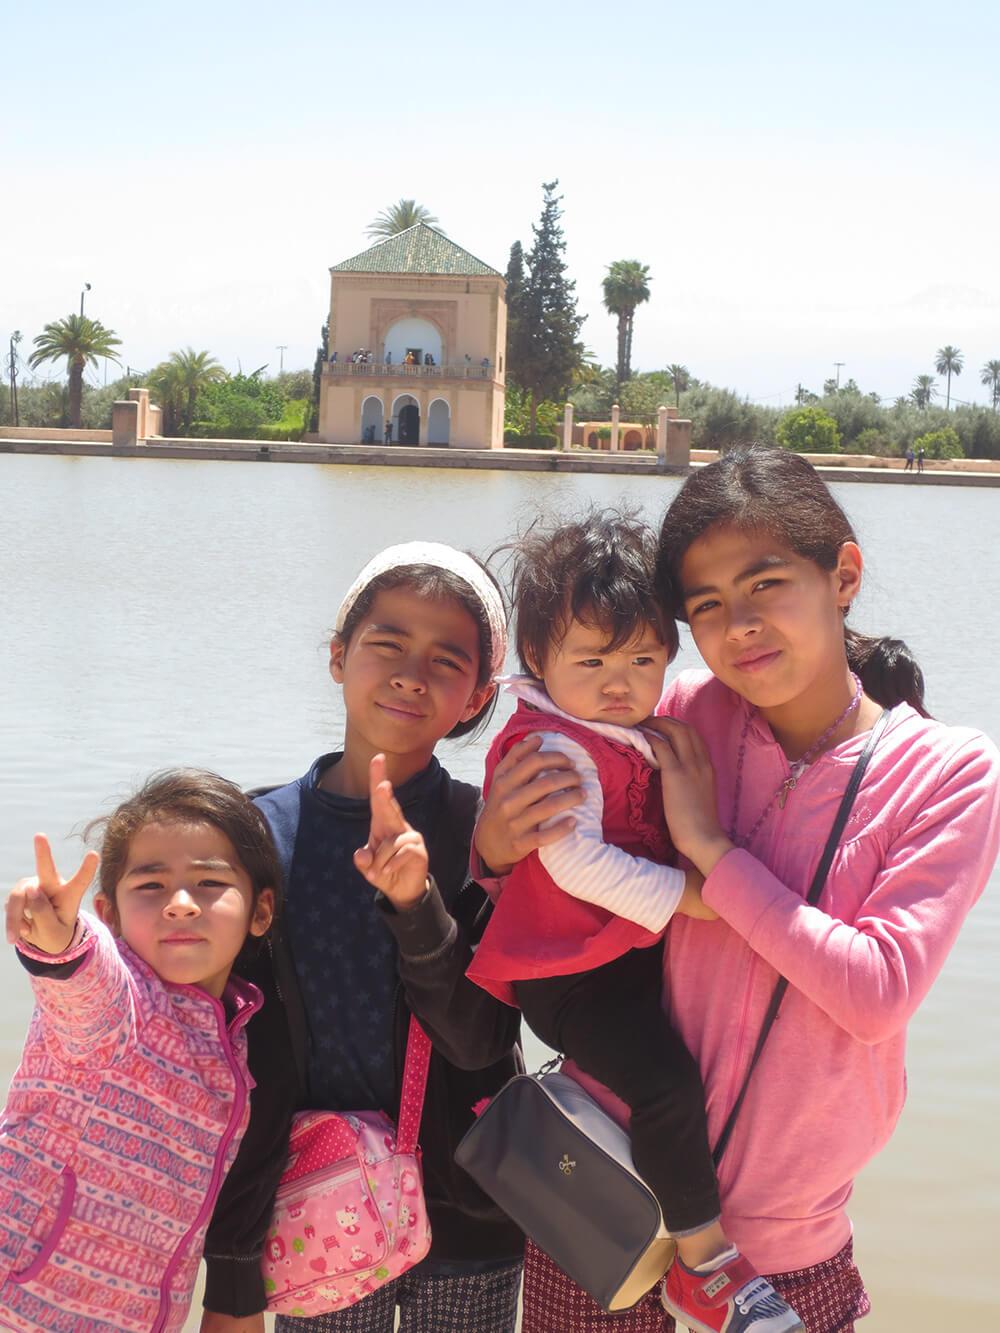 http://www.marrakechdream.ma/wp-content/uploads/2017/07/IMG_0560.jpg